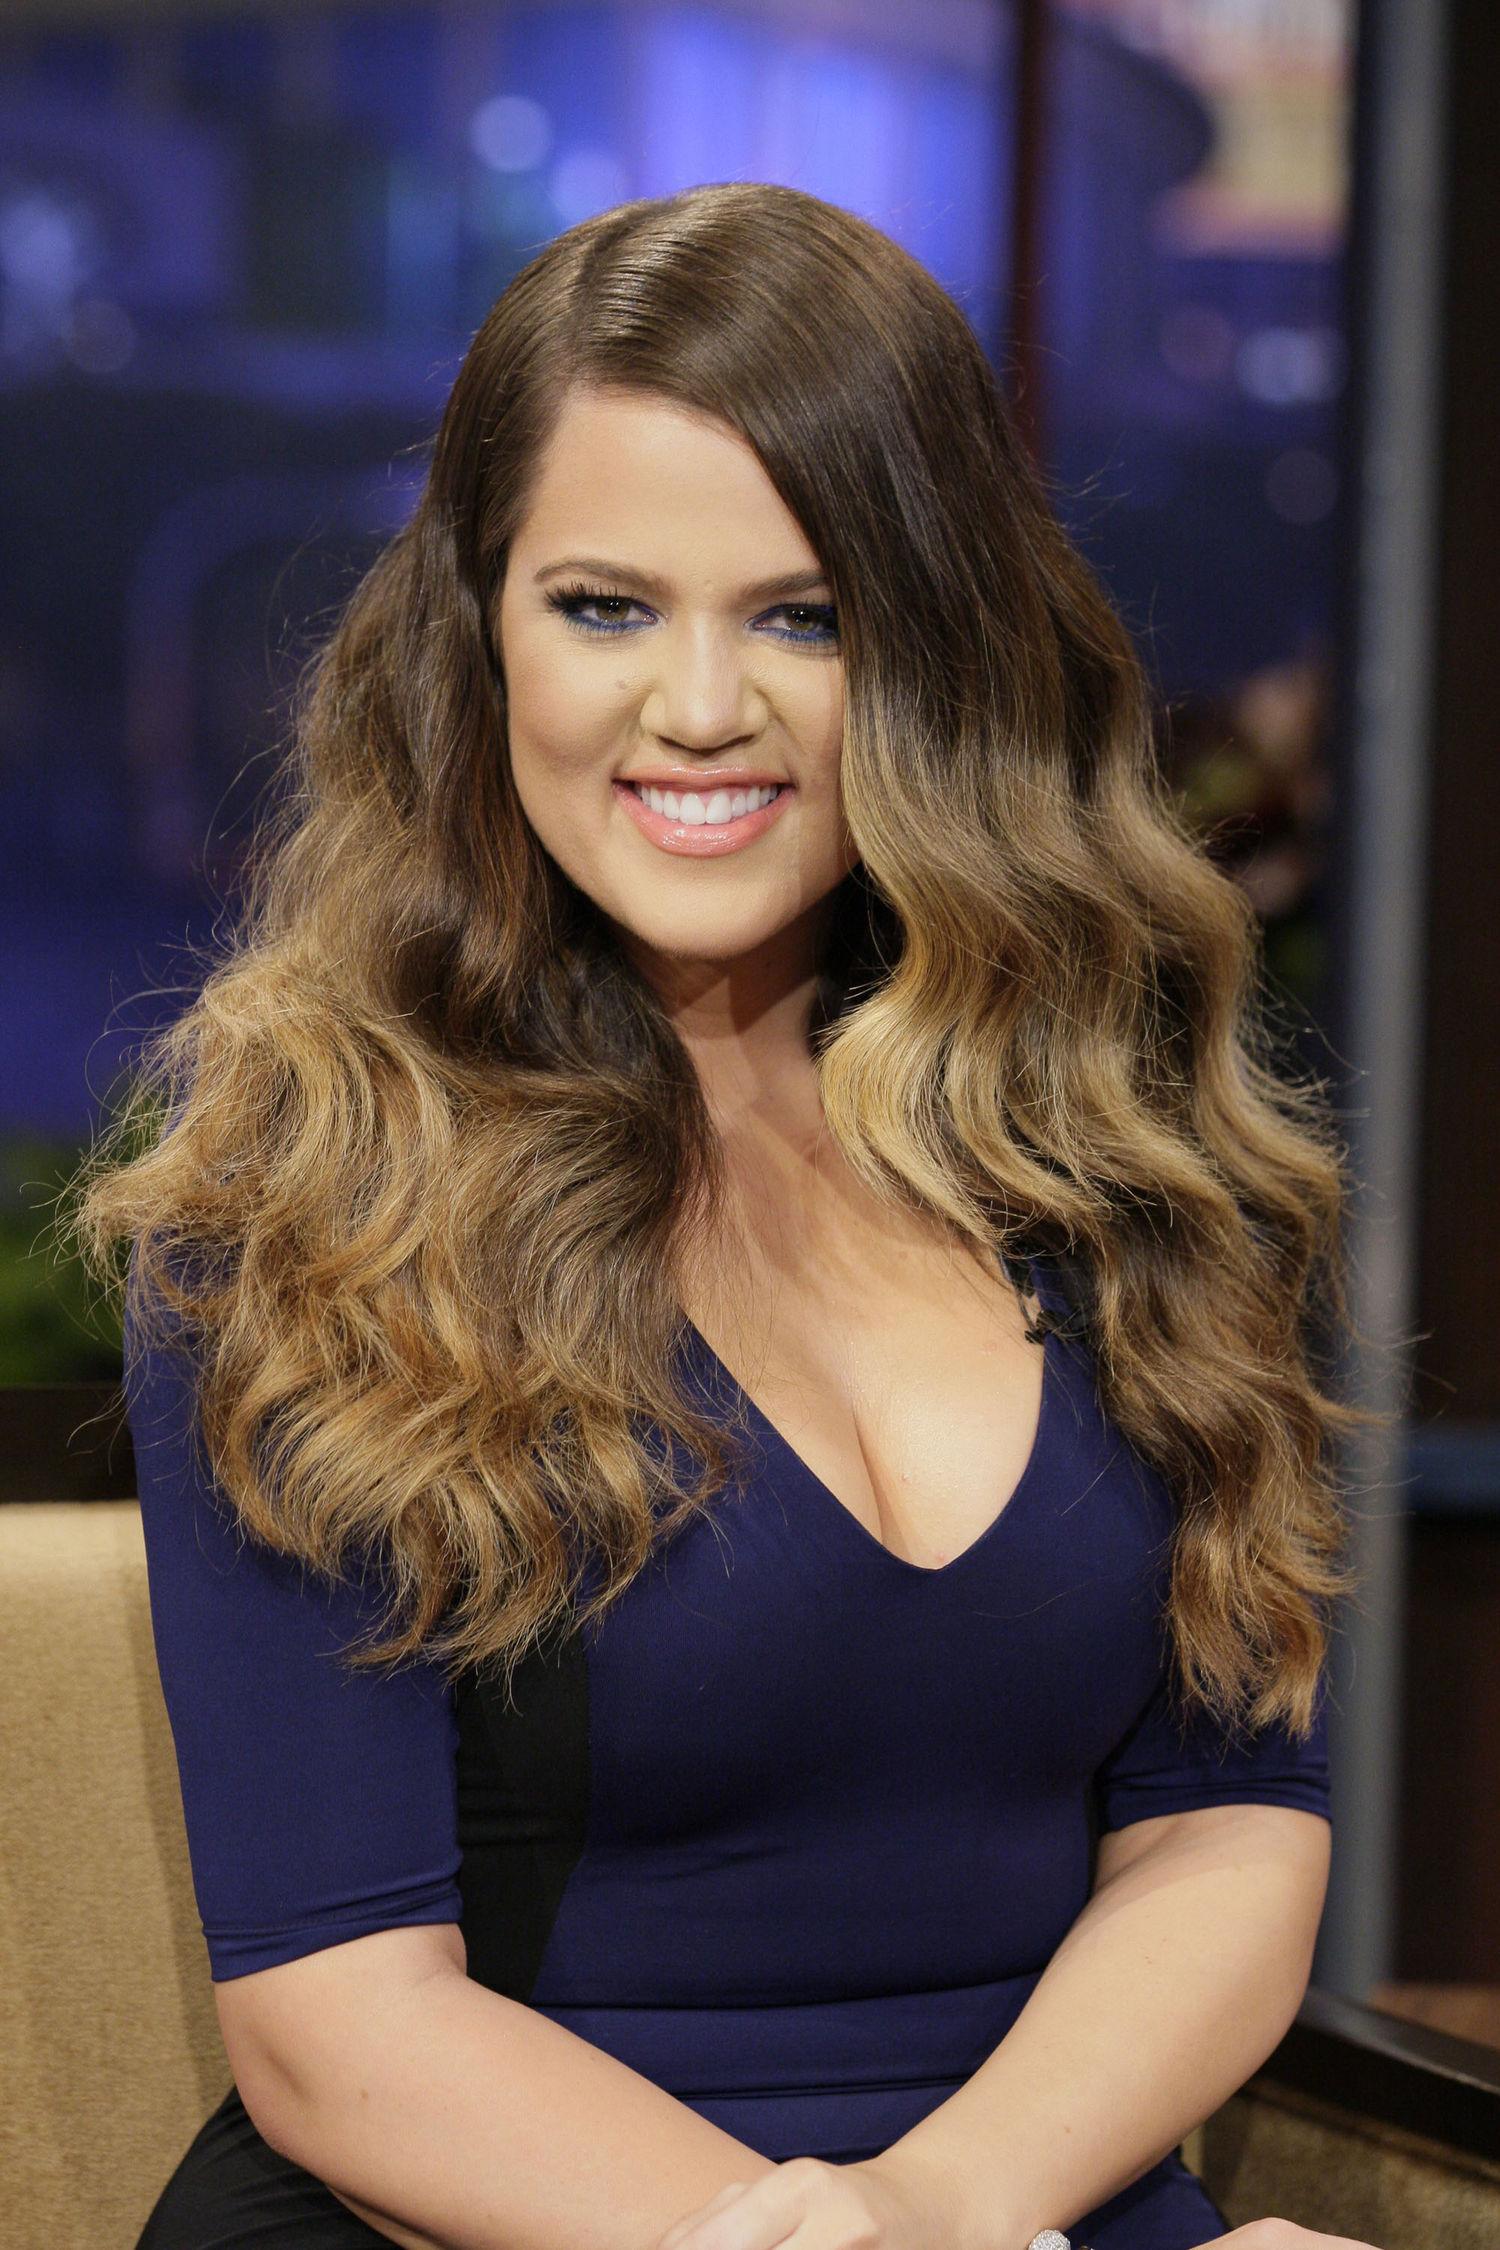 19 Khloe Kardashian Hair Styles That You Can Copy At Home